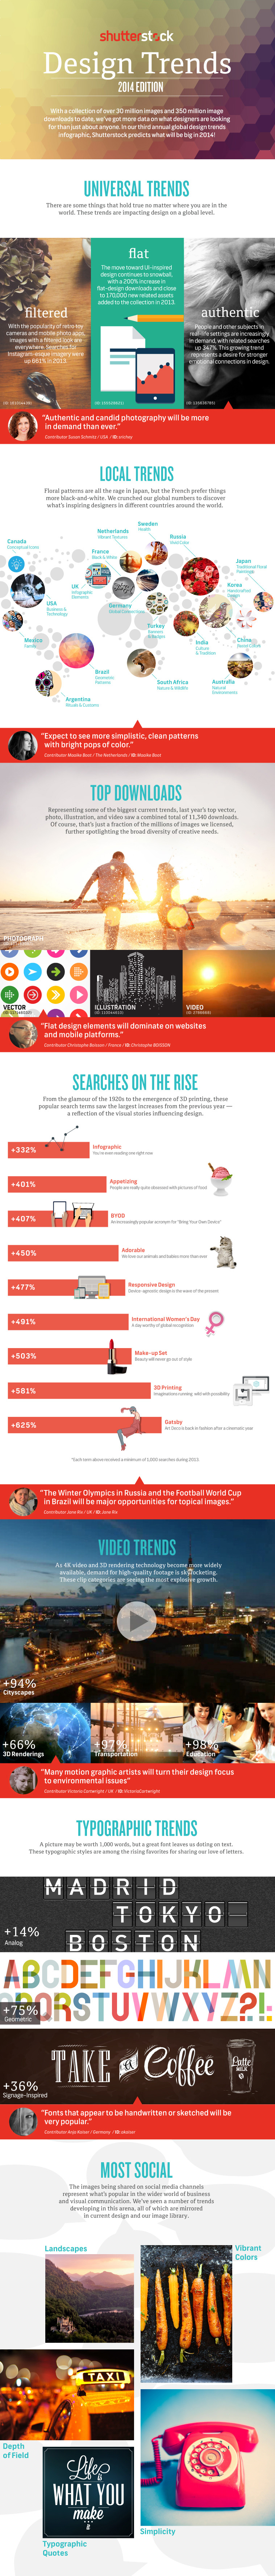 2014 Global Design Trends